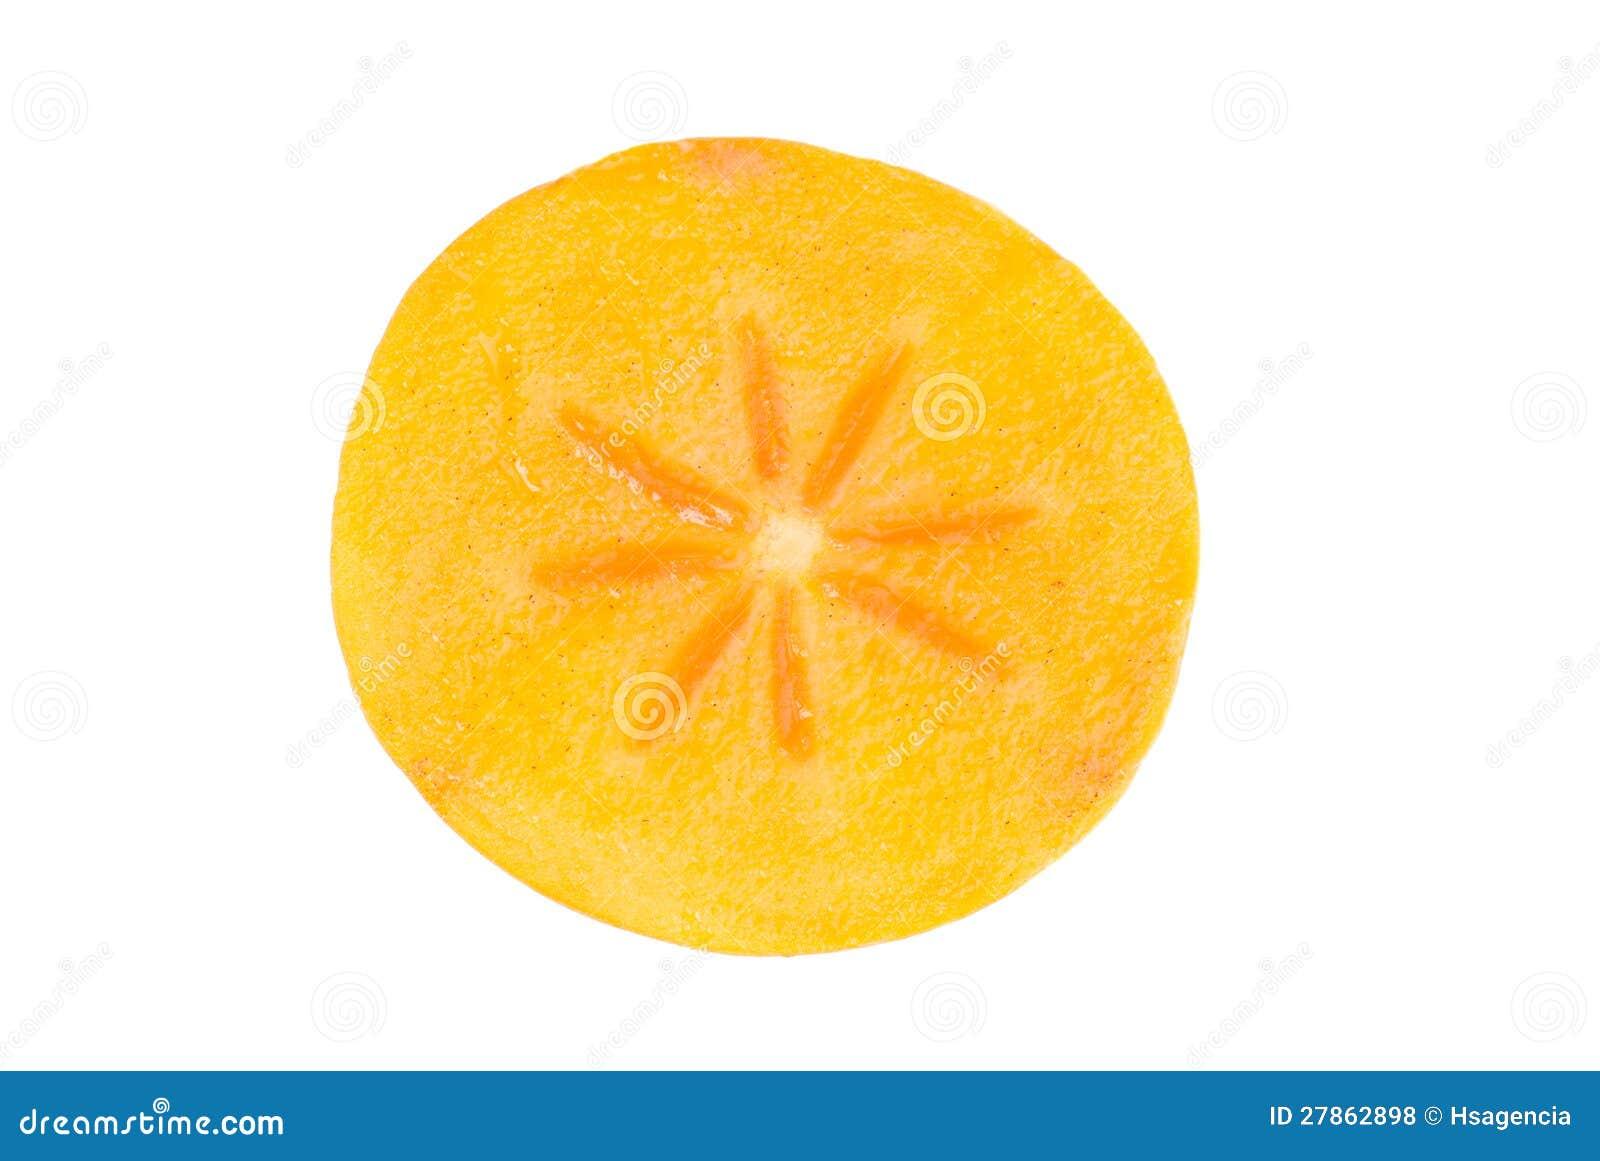 Persimmon owoc plasterek na biel